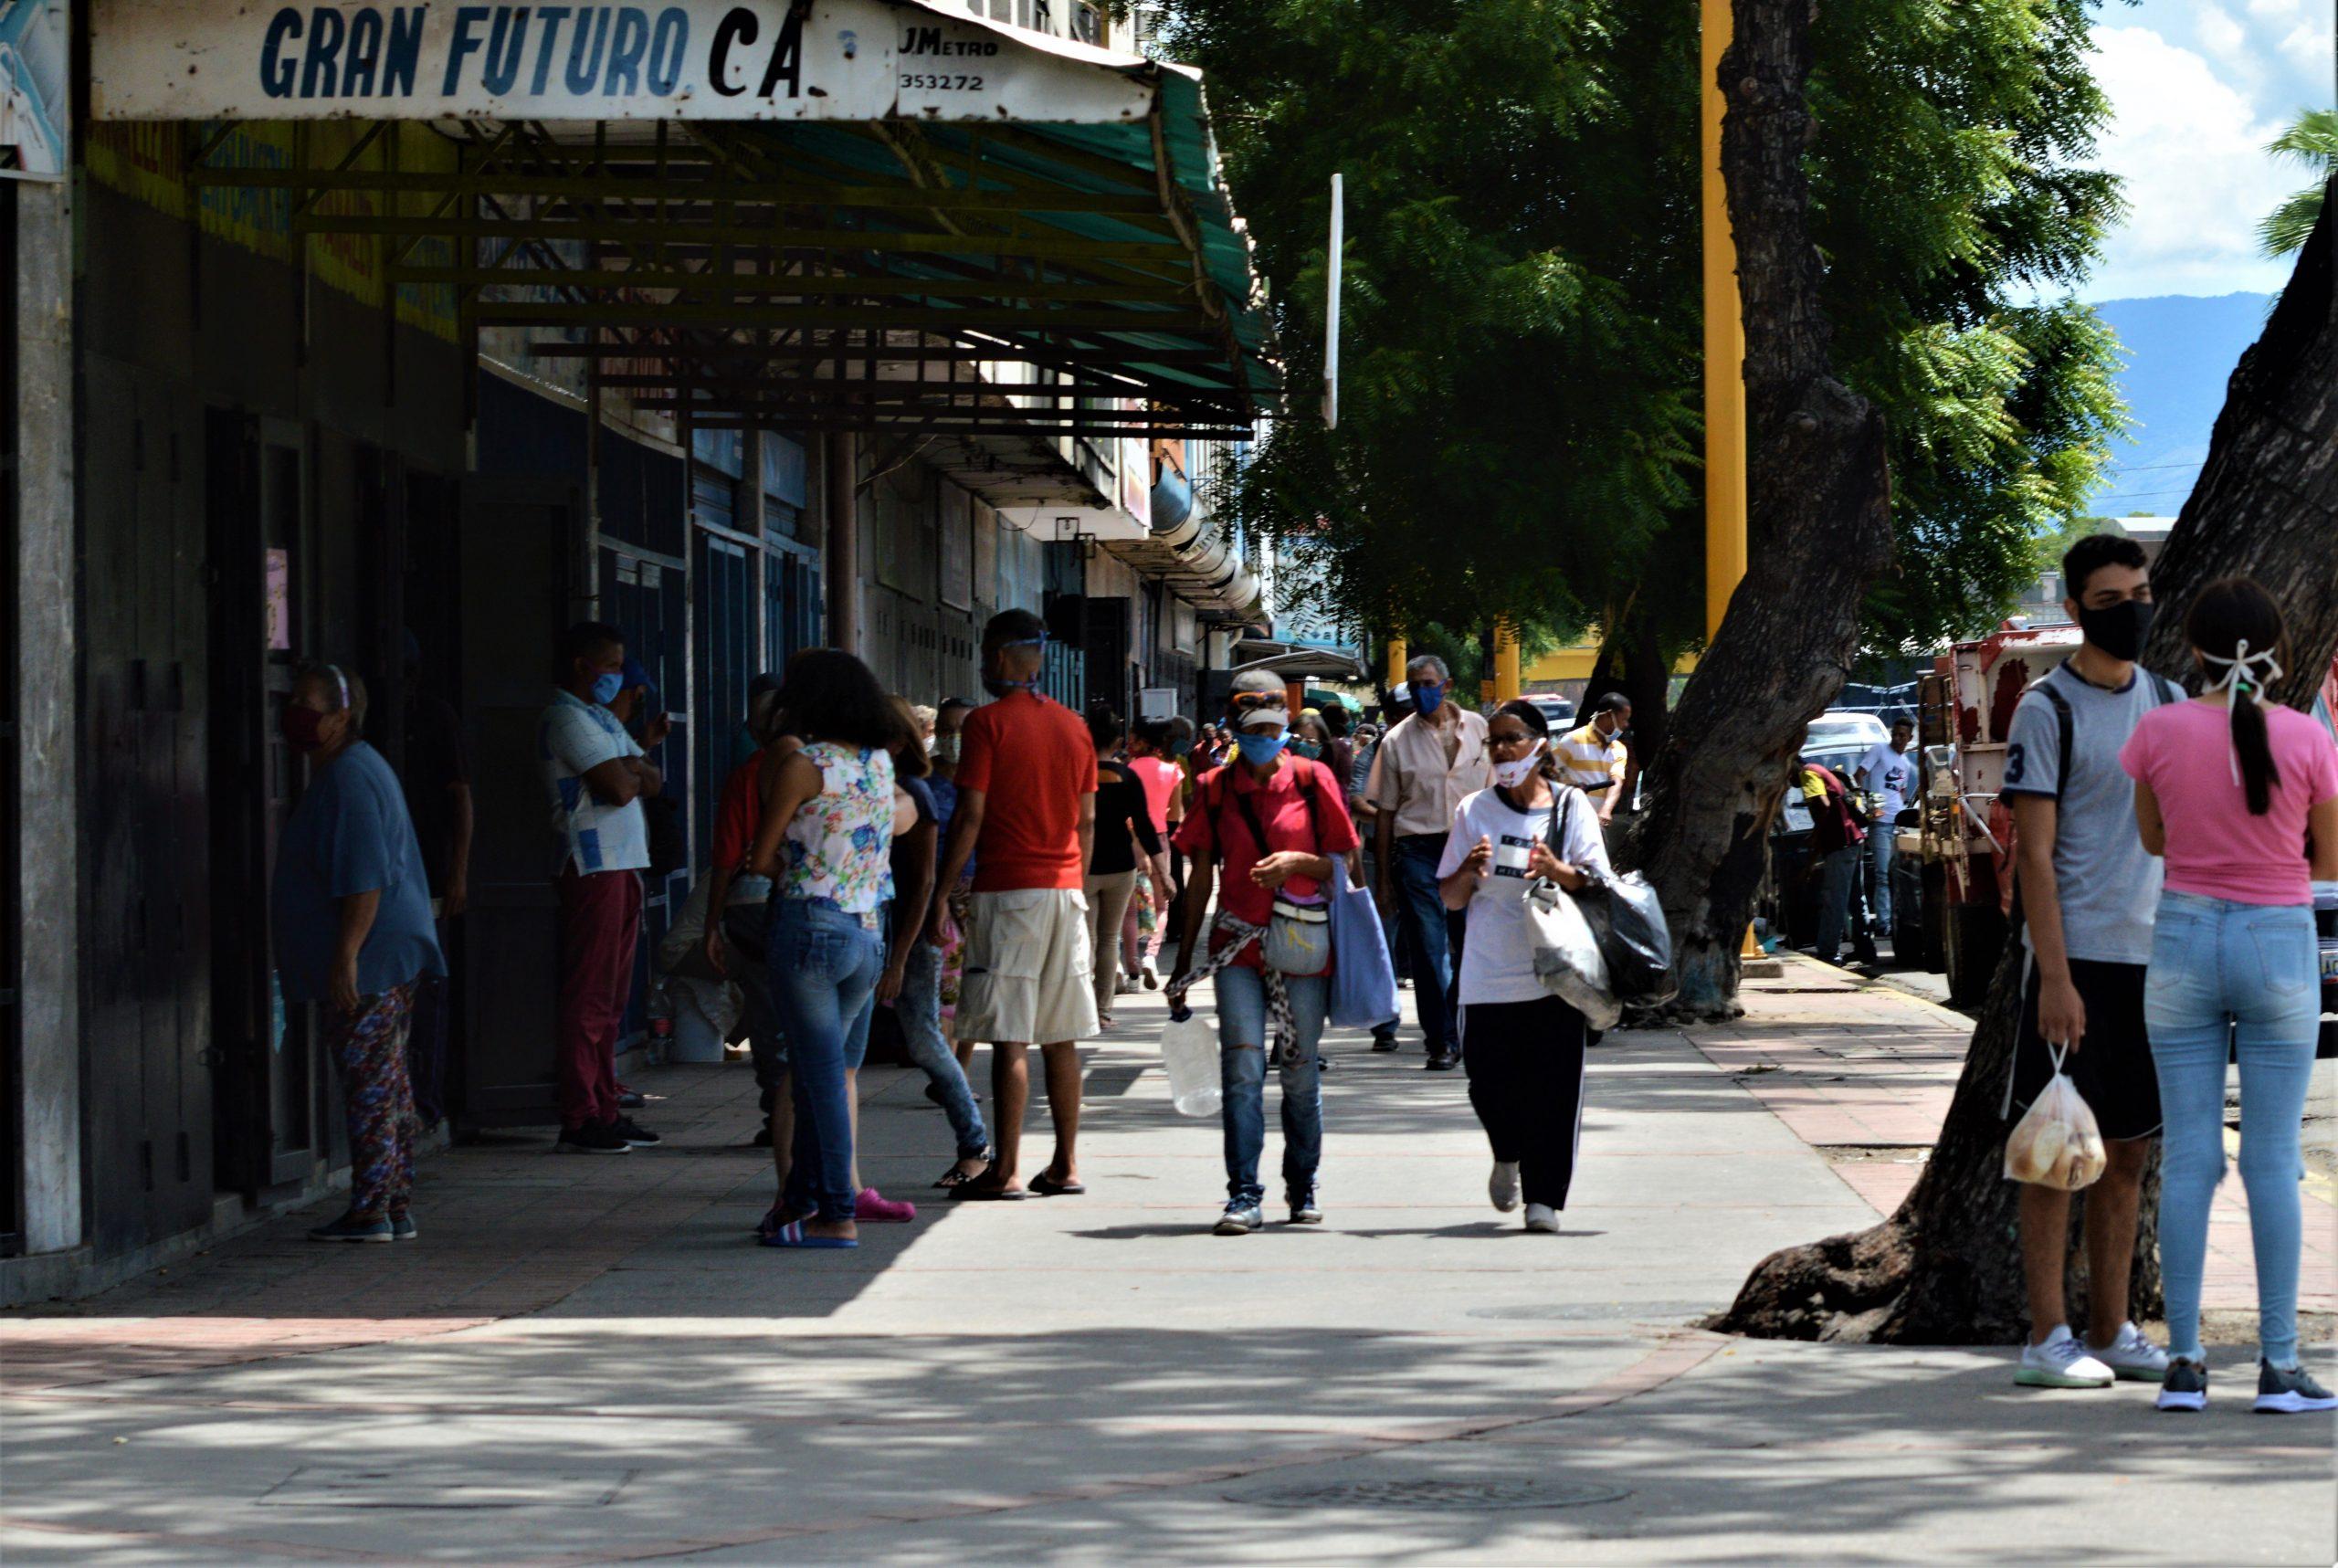 https://www.noticias-ahora.com/venezuela-282-casos-de-coronavirus-tres-fallecidos/